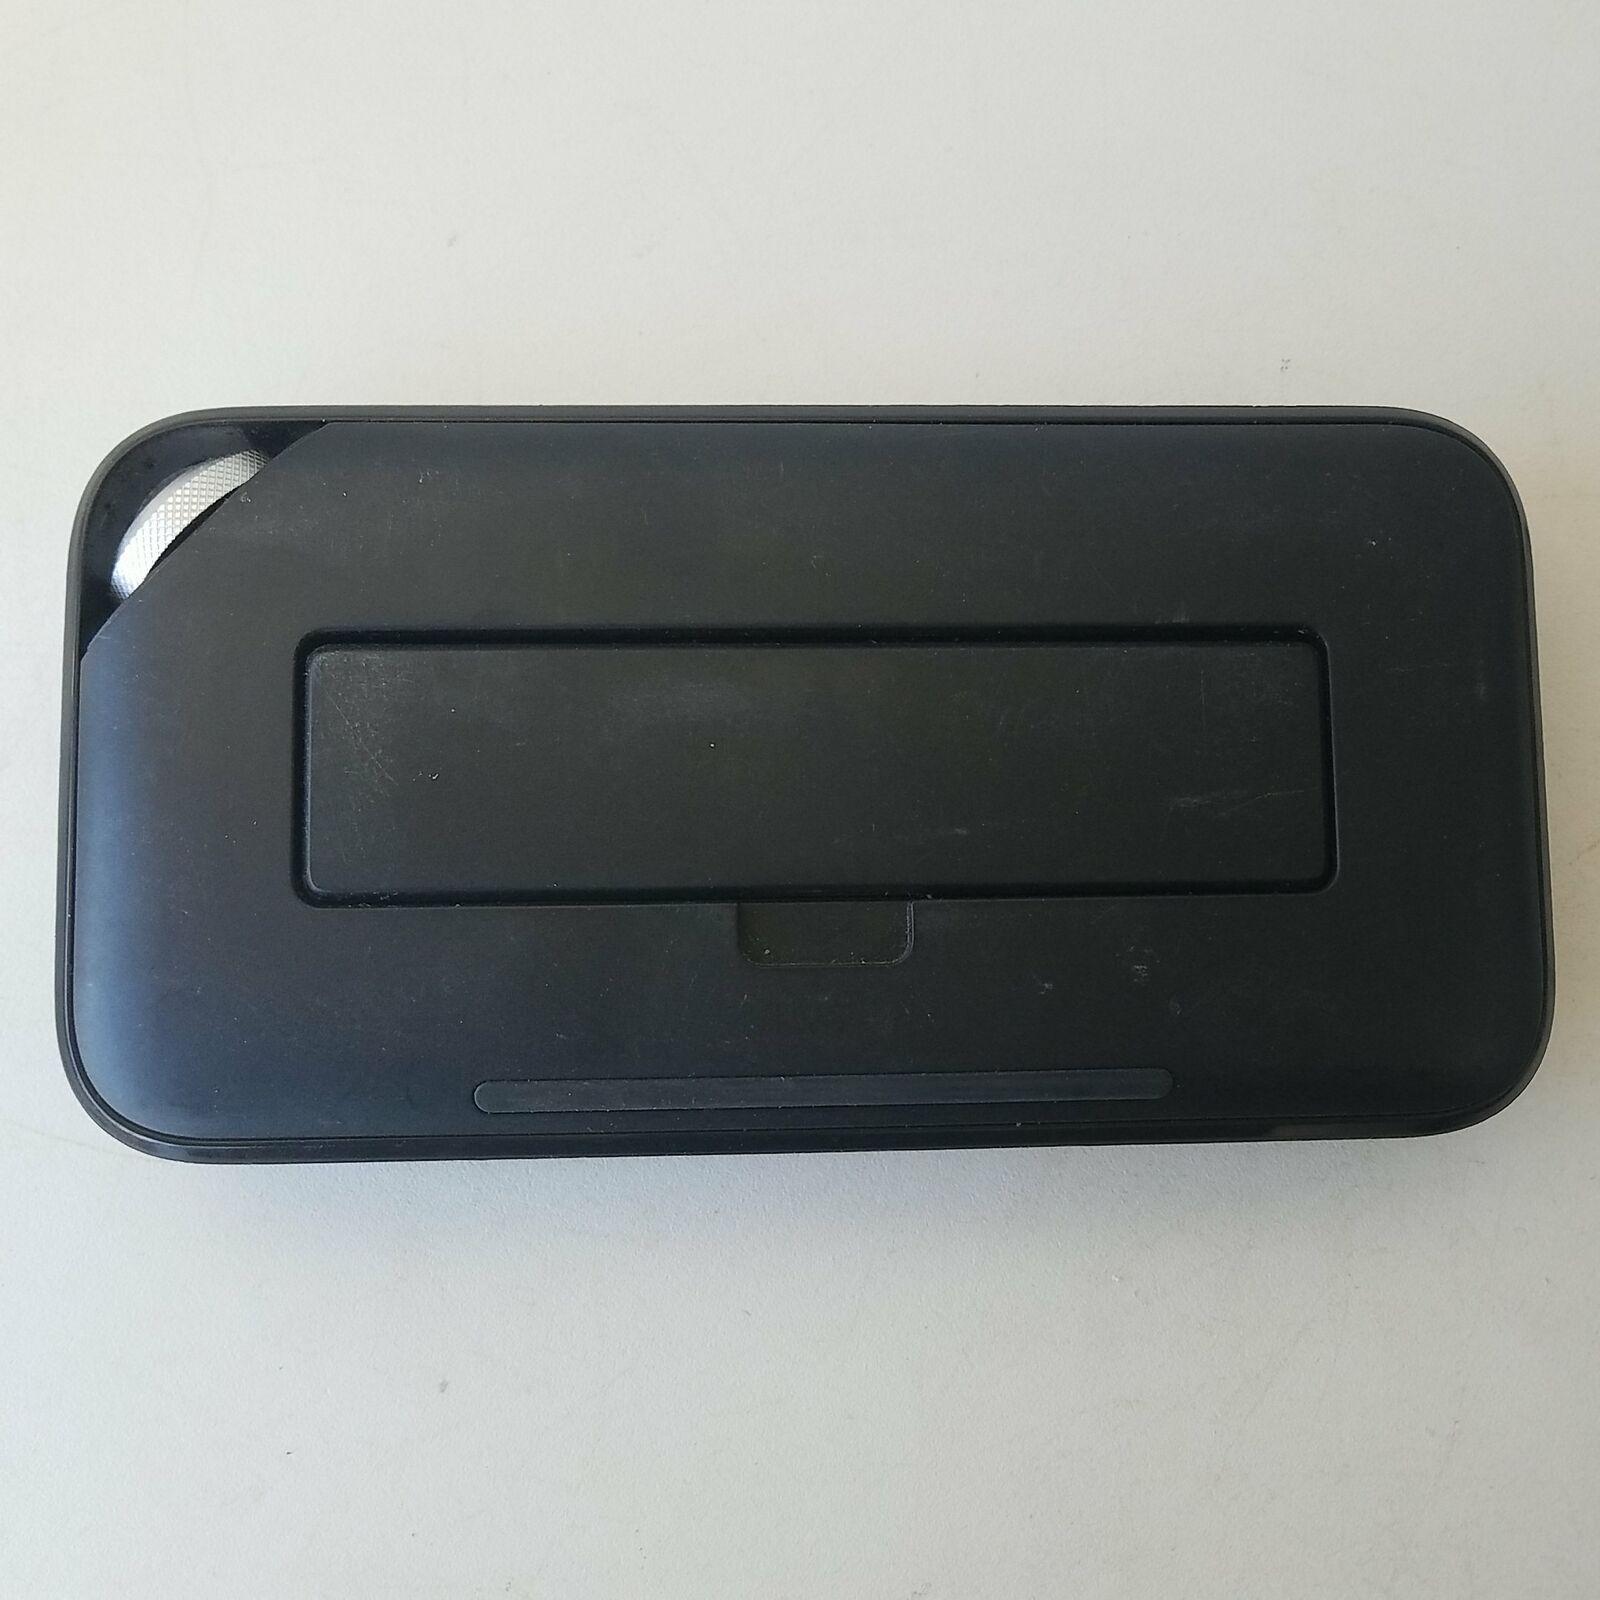 Philips BT-3500B/37 Bluetooth Wireless Portable Speaker